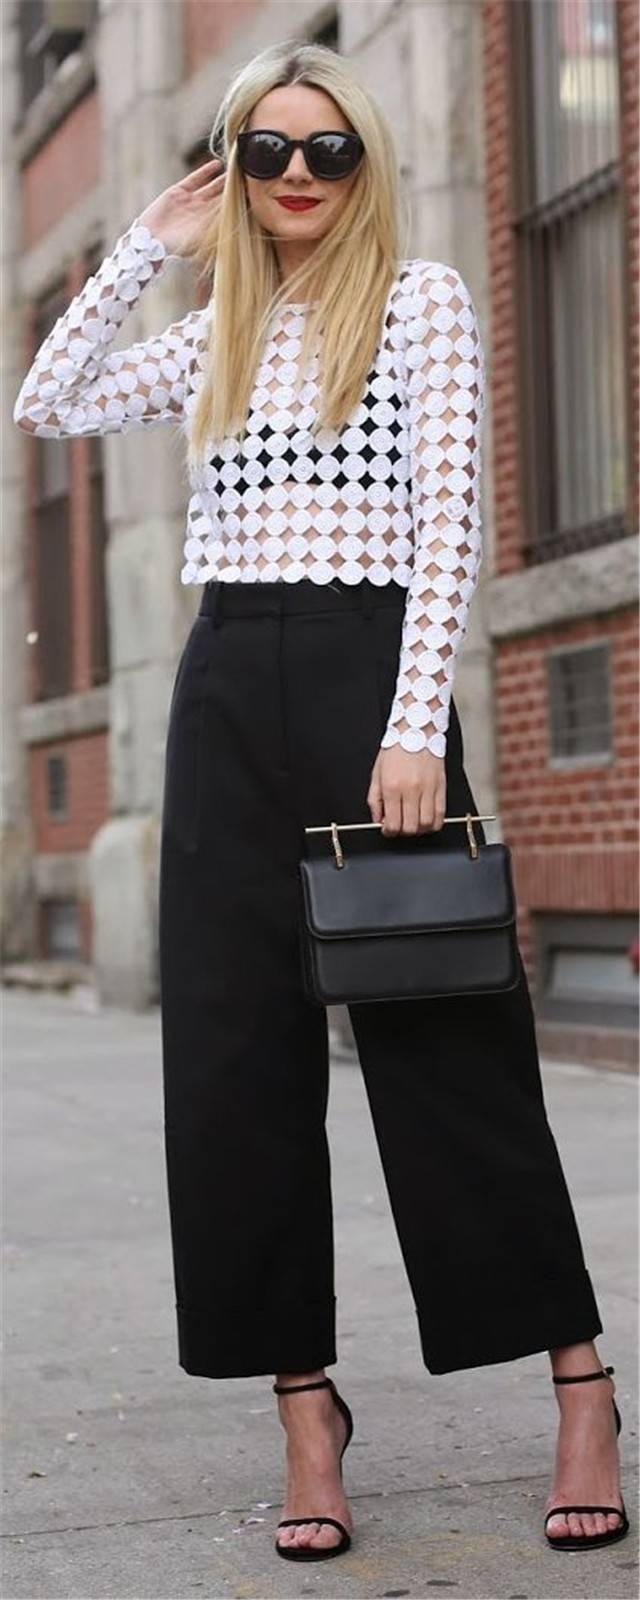 summer-work-outfit-crop-oversized-shirt 80+ Elegant Summer Outfit Ideas for Business Women